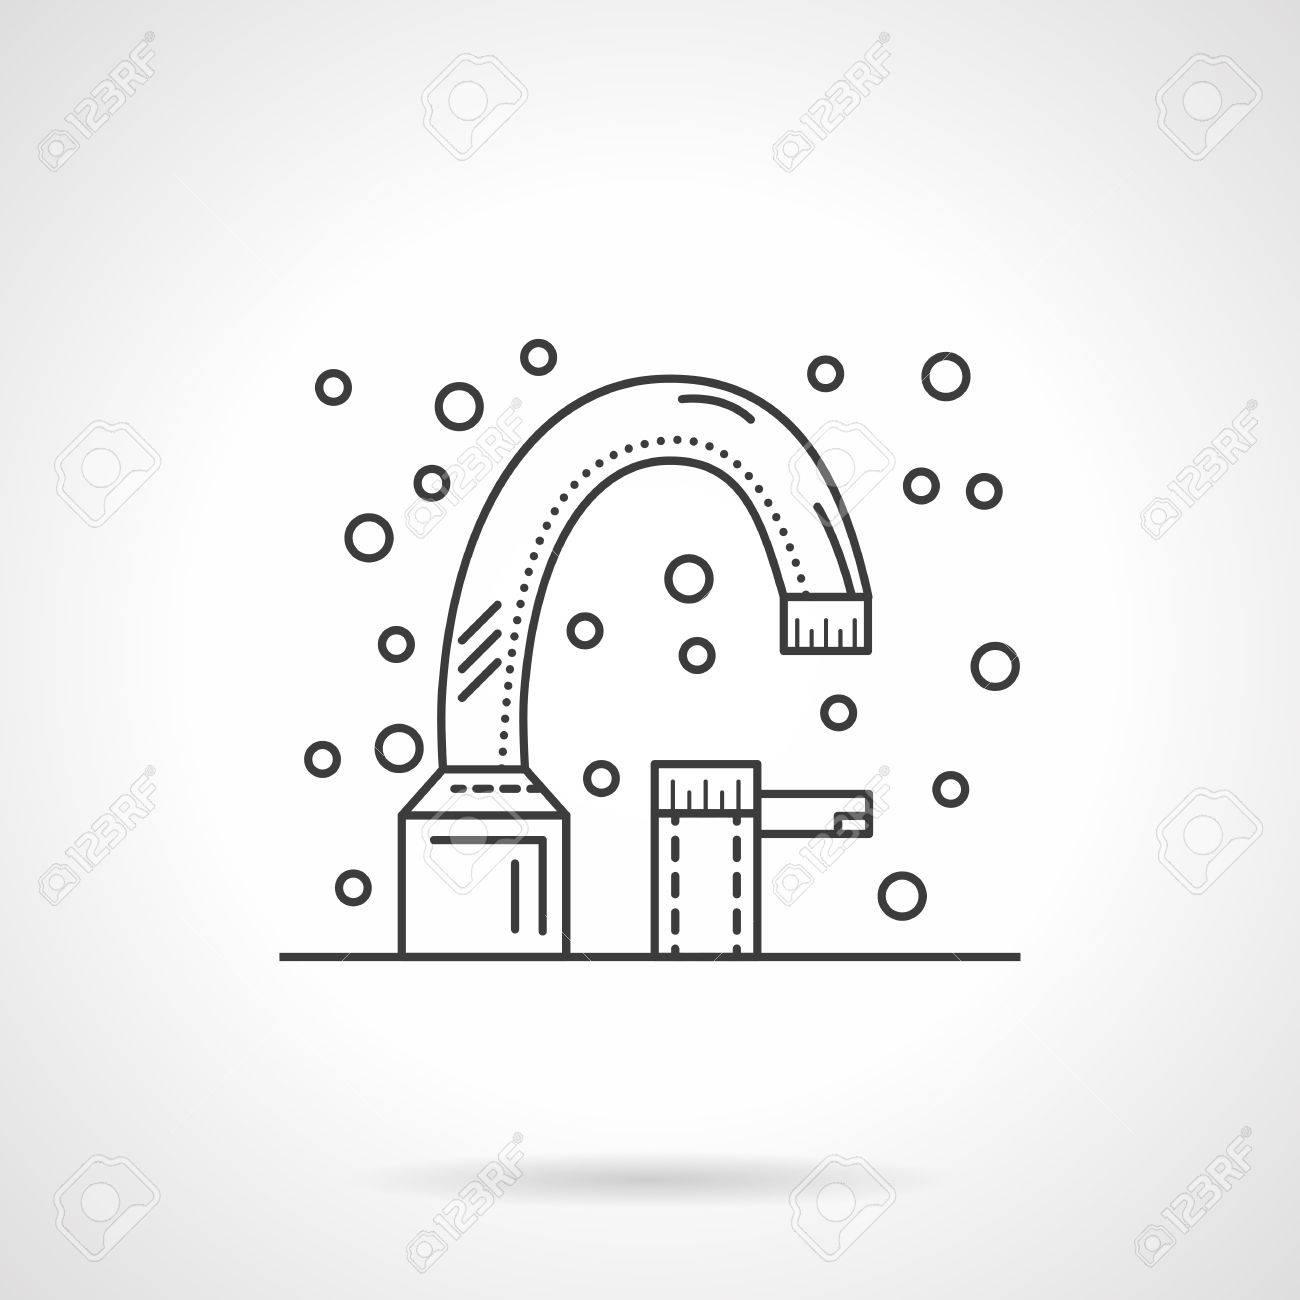 Faucet For Bathroom Washstand. Bathroom Equipment. Hygiene ...